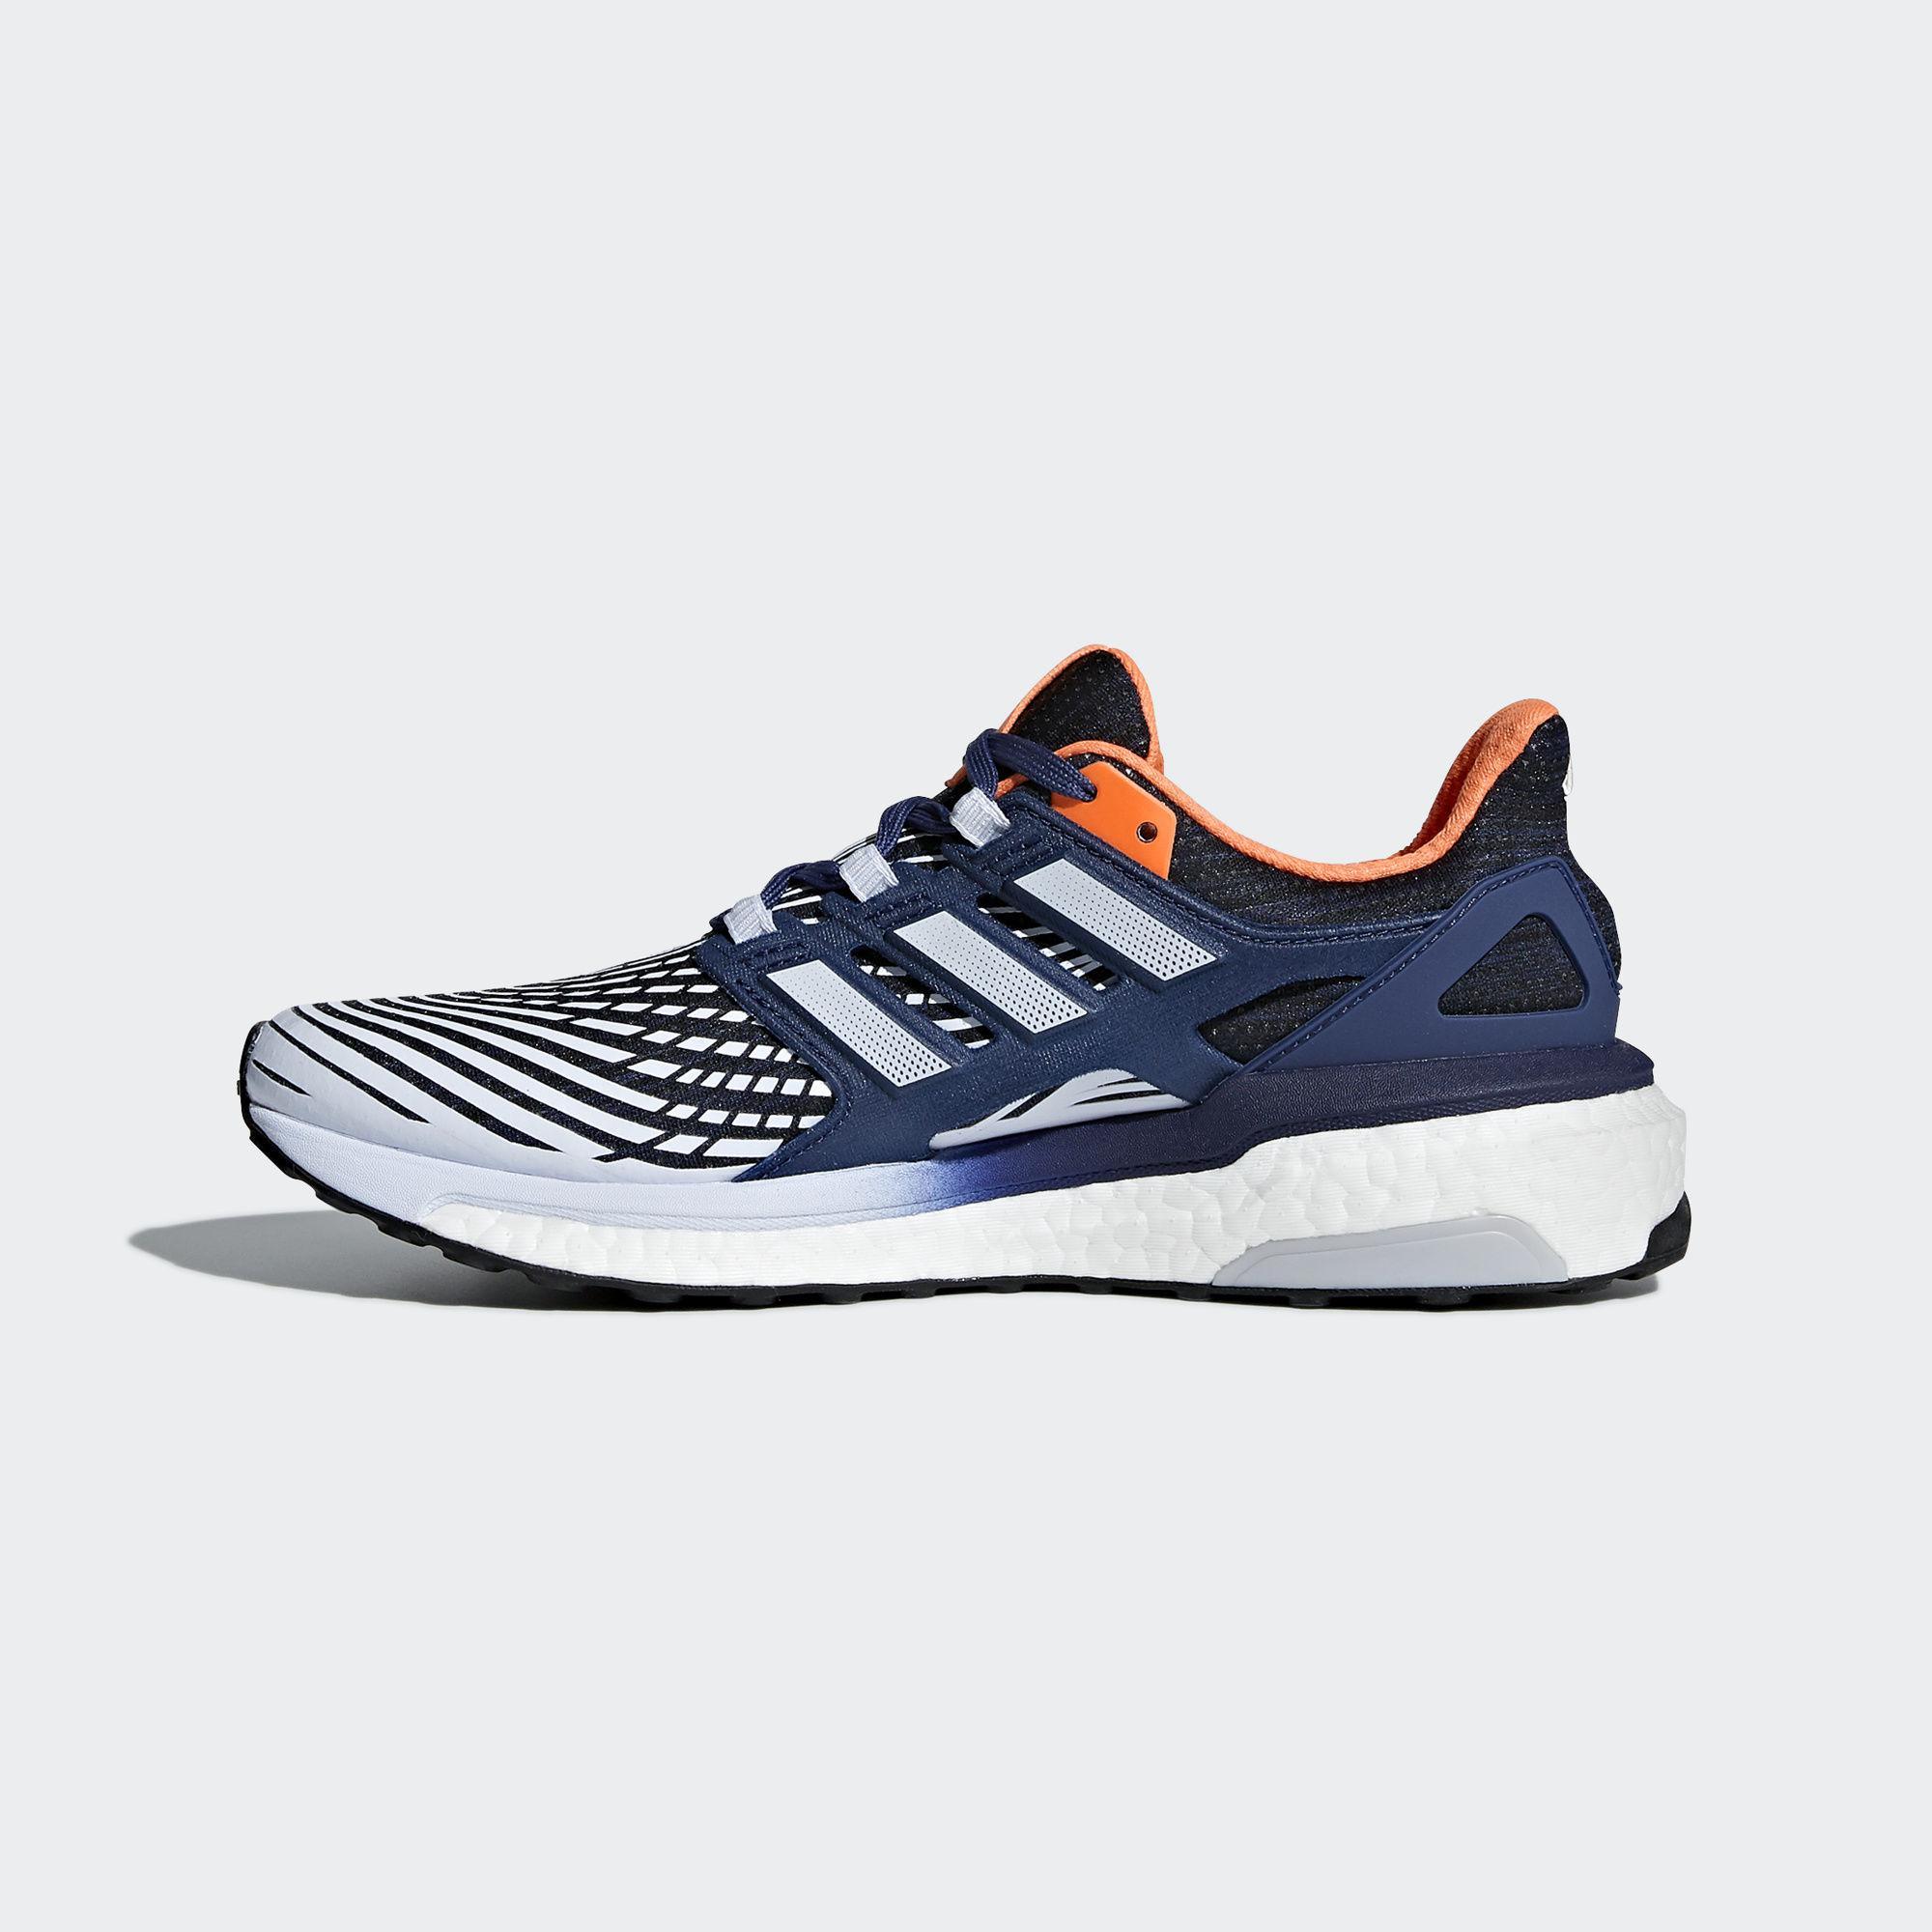 2b07bed243f6 Adidas Womens Energy Boost Running Shoes - Blue Orange - Tennisnuts.com